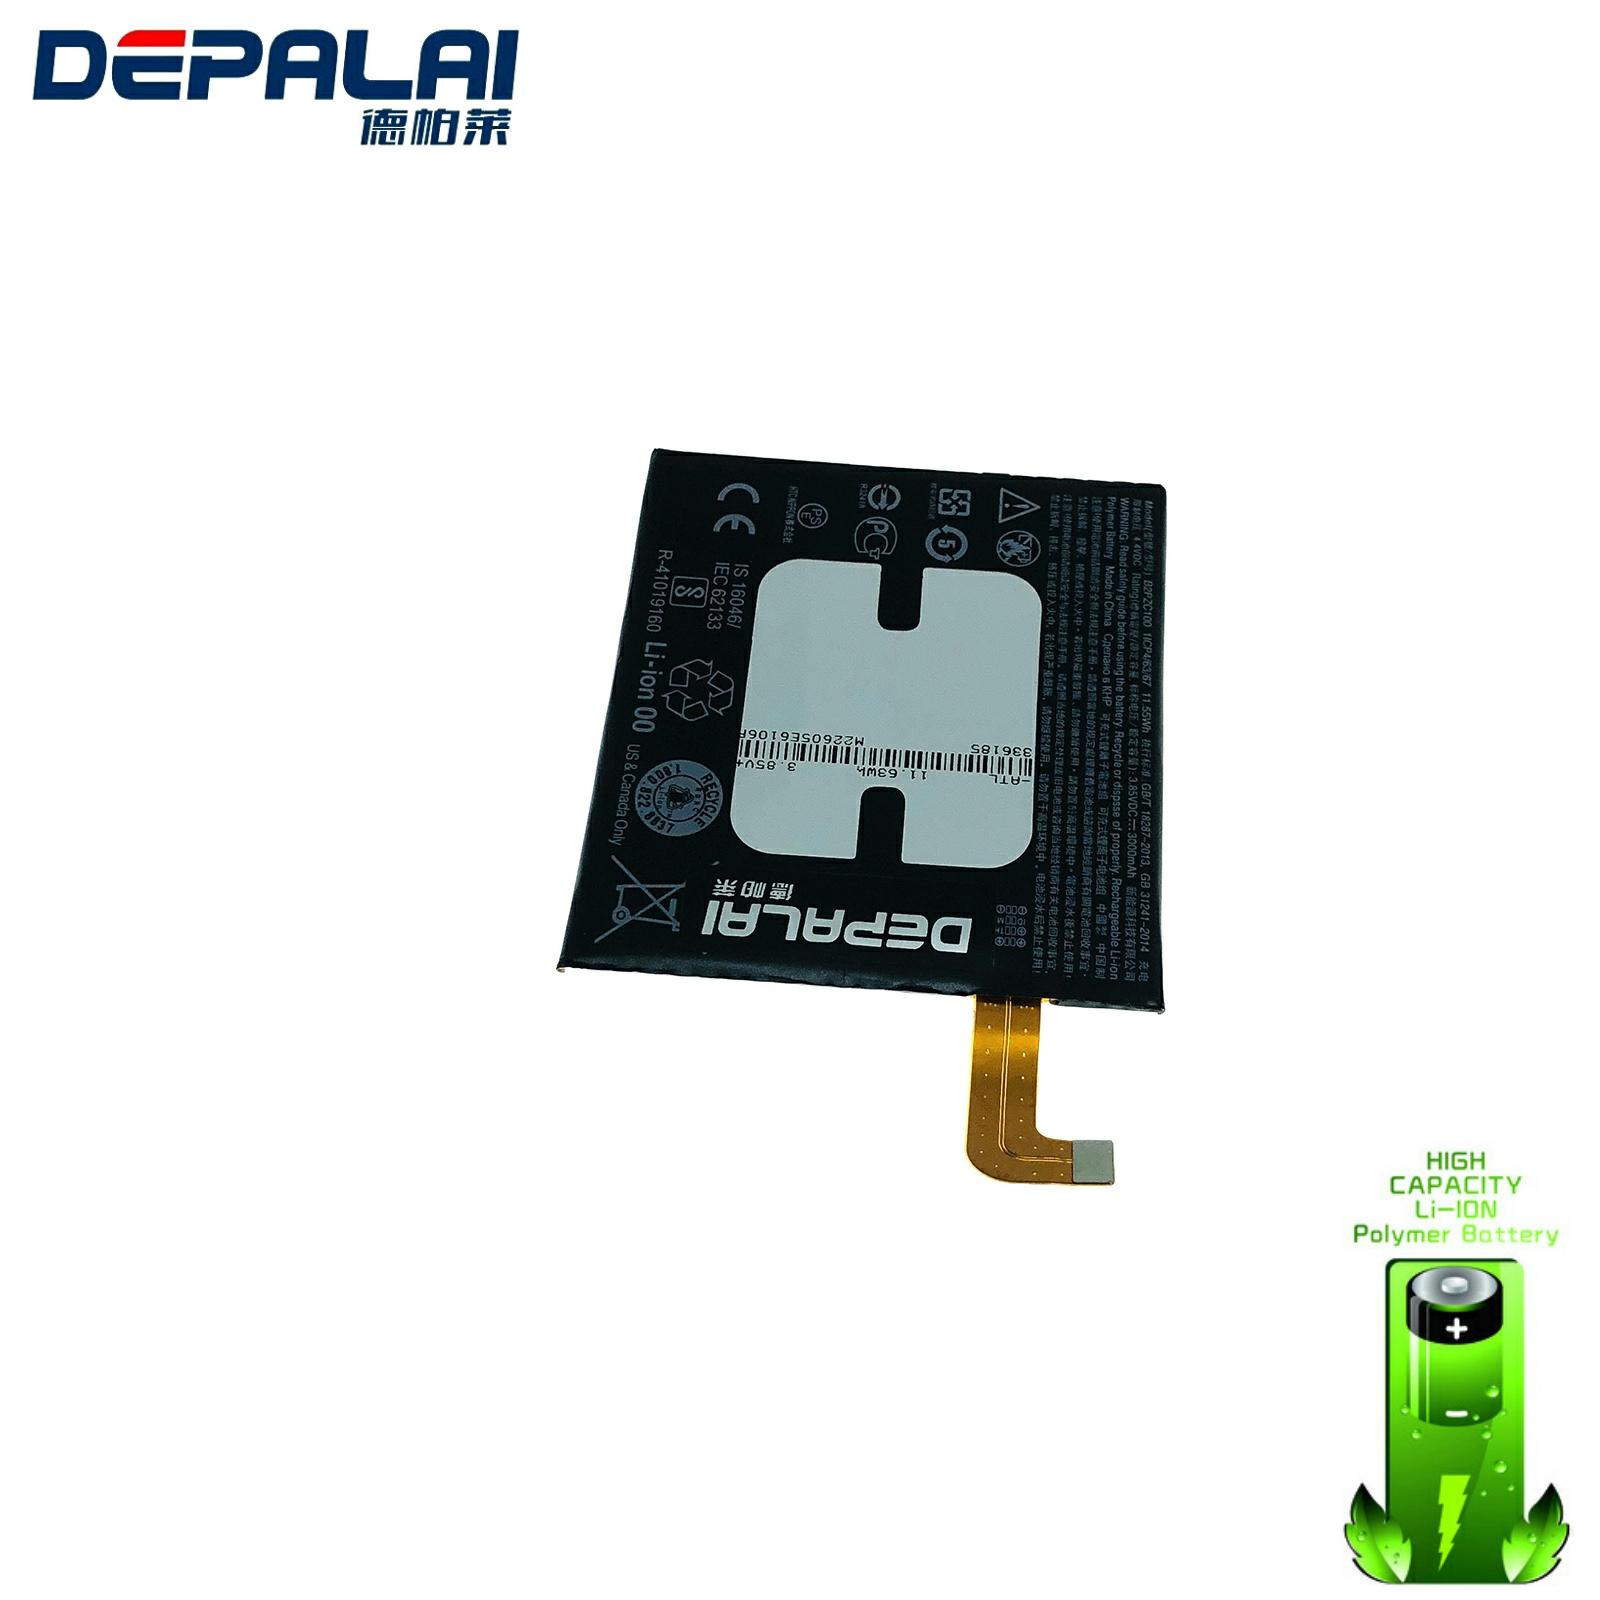 High Quality 3000mAh B2PZC100 Battery Fit For HTC U-3U U11 601HT Sprint 2PZC5 Batteries Batterij High Capacity